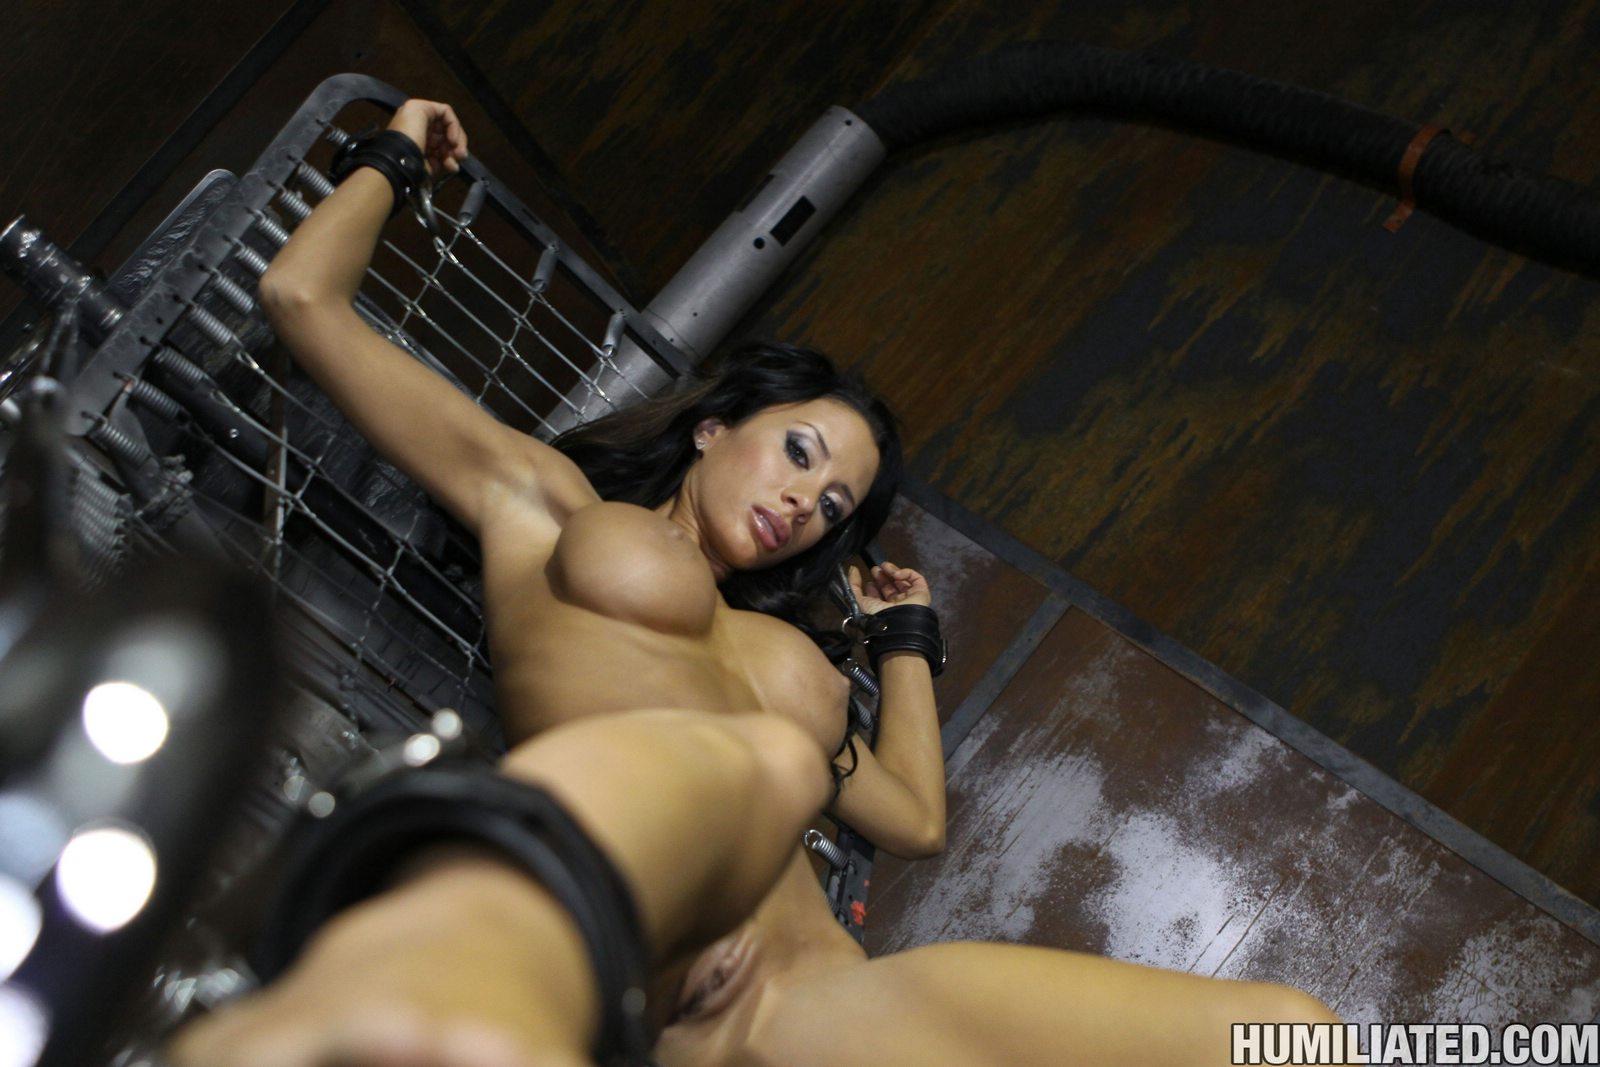 Mya nicole porn star